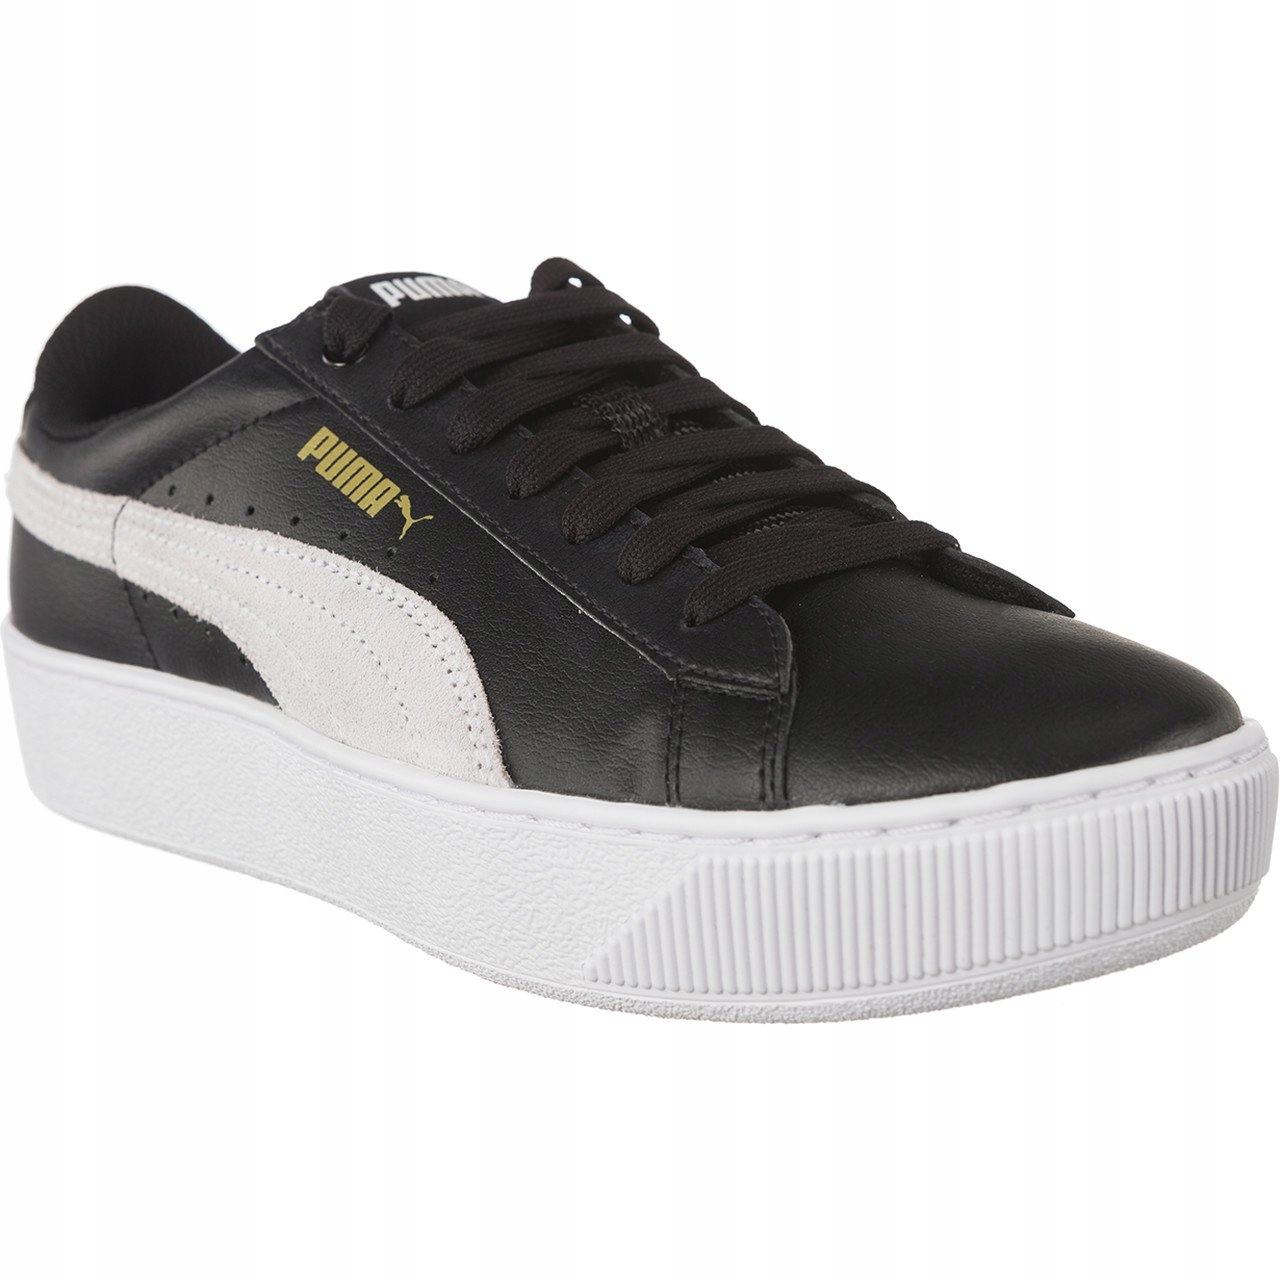 timeless design bb4c4 7be5e Damskie Sneakersy PUMA VIKKY PLATFORM L 01 ~40,5~